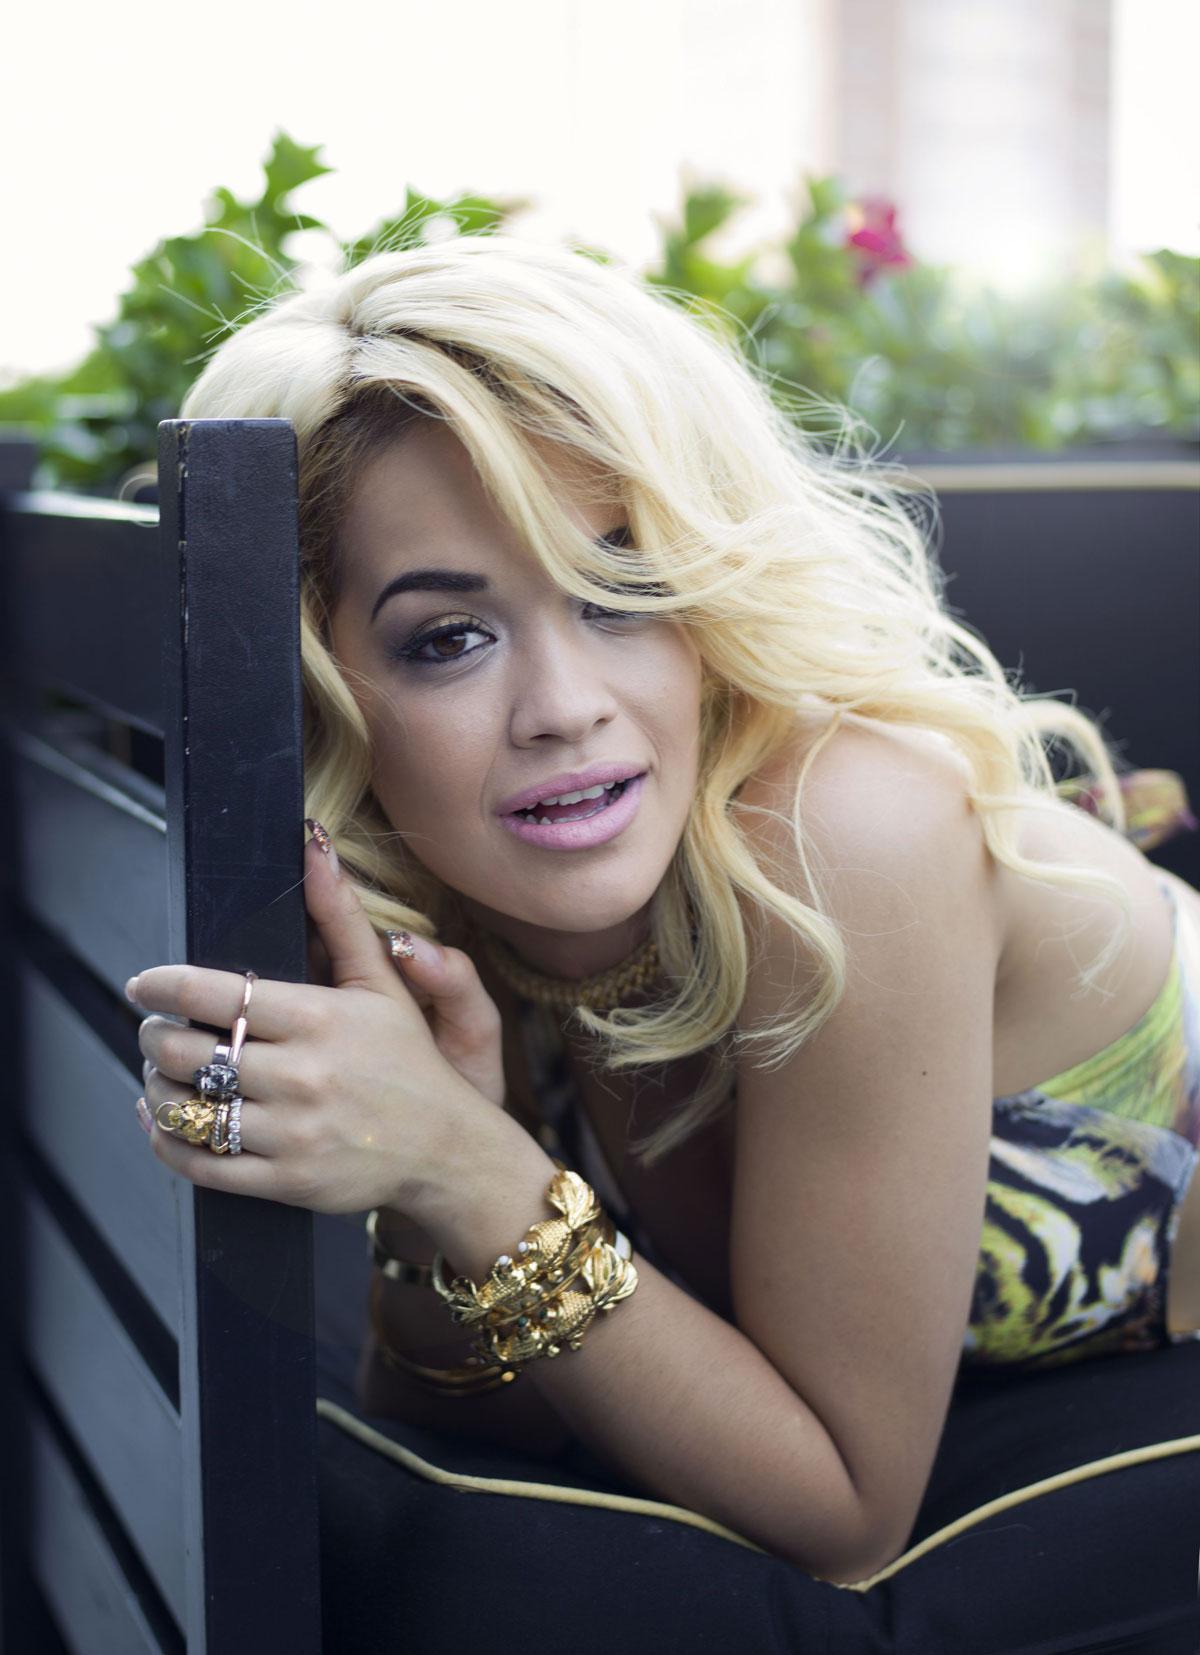 Rita Ora Fashion Shoot Photos: RITA ORA In Swimsuit At Victoria Will Photoshoot